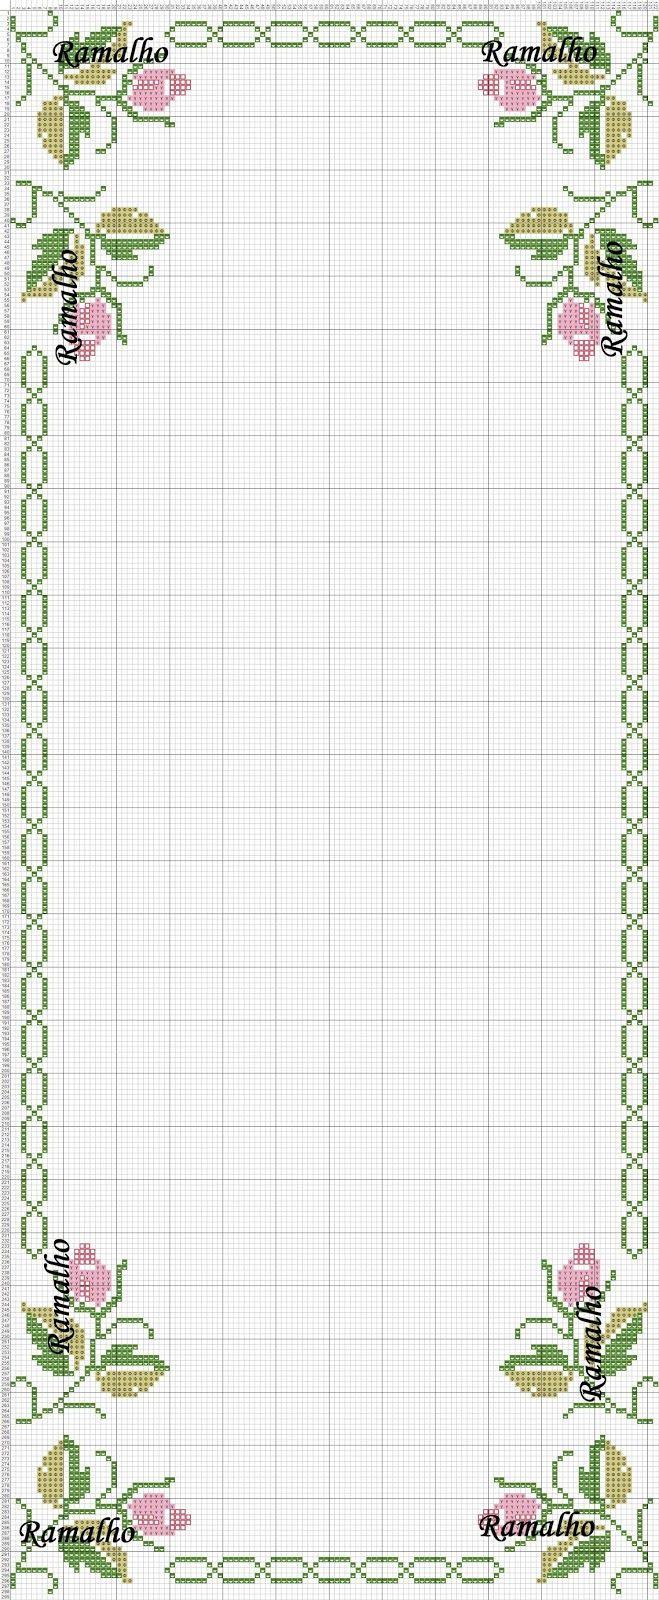 caminho++botoes.jpg (659×1600)